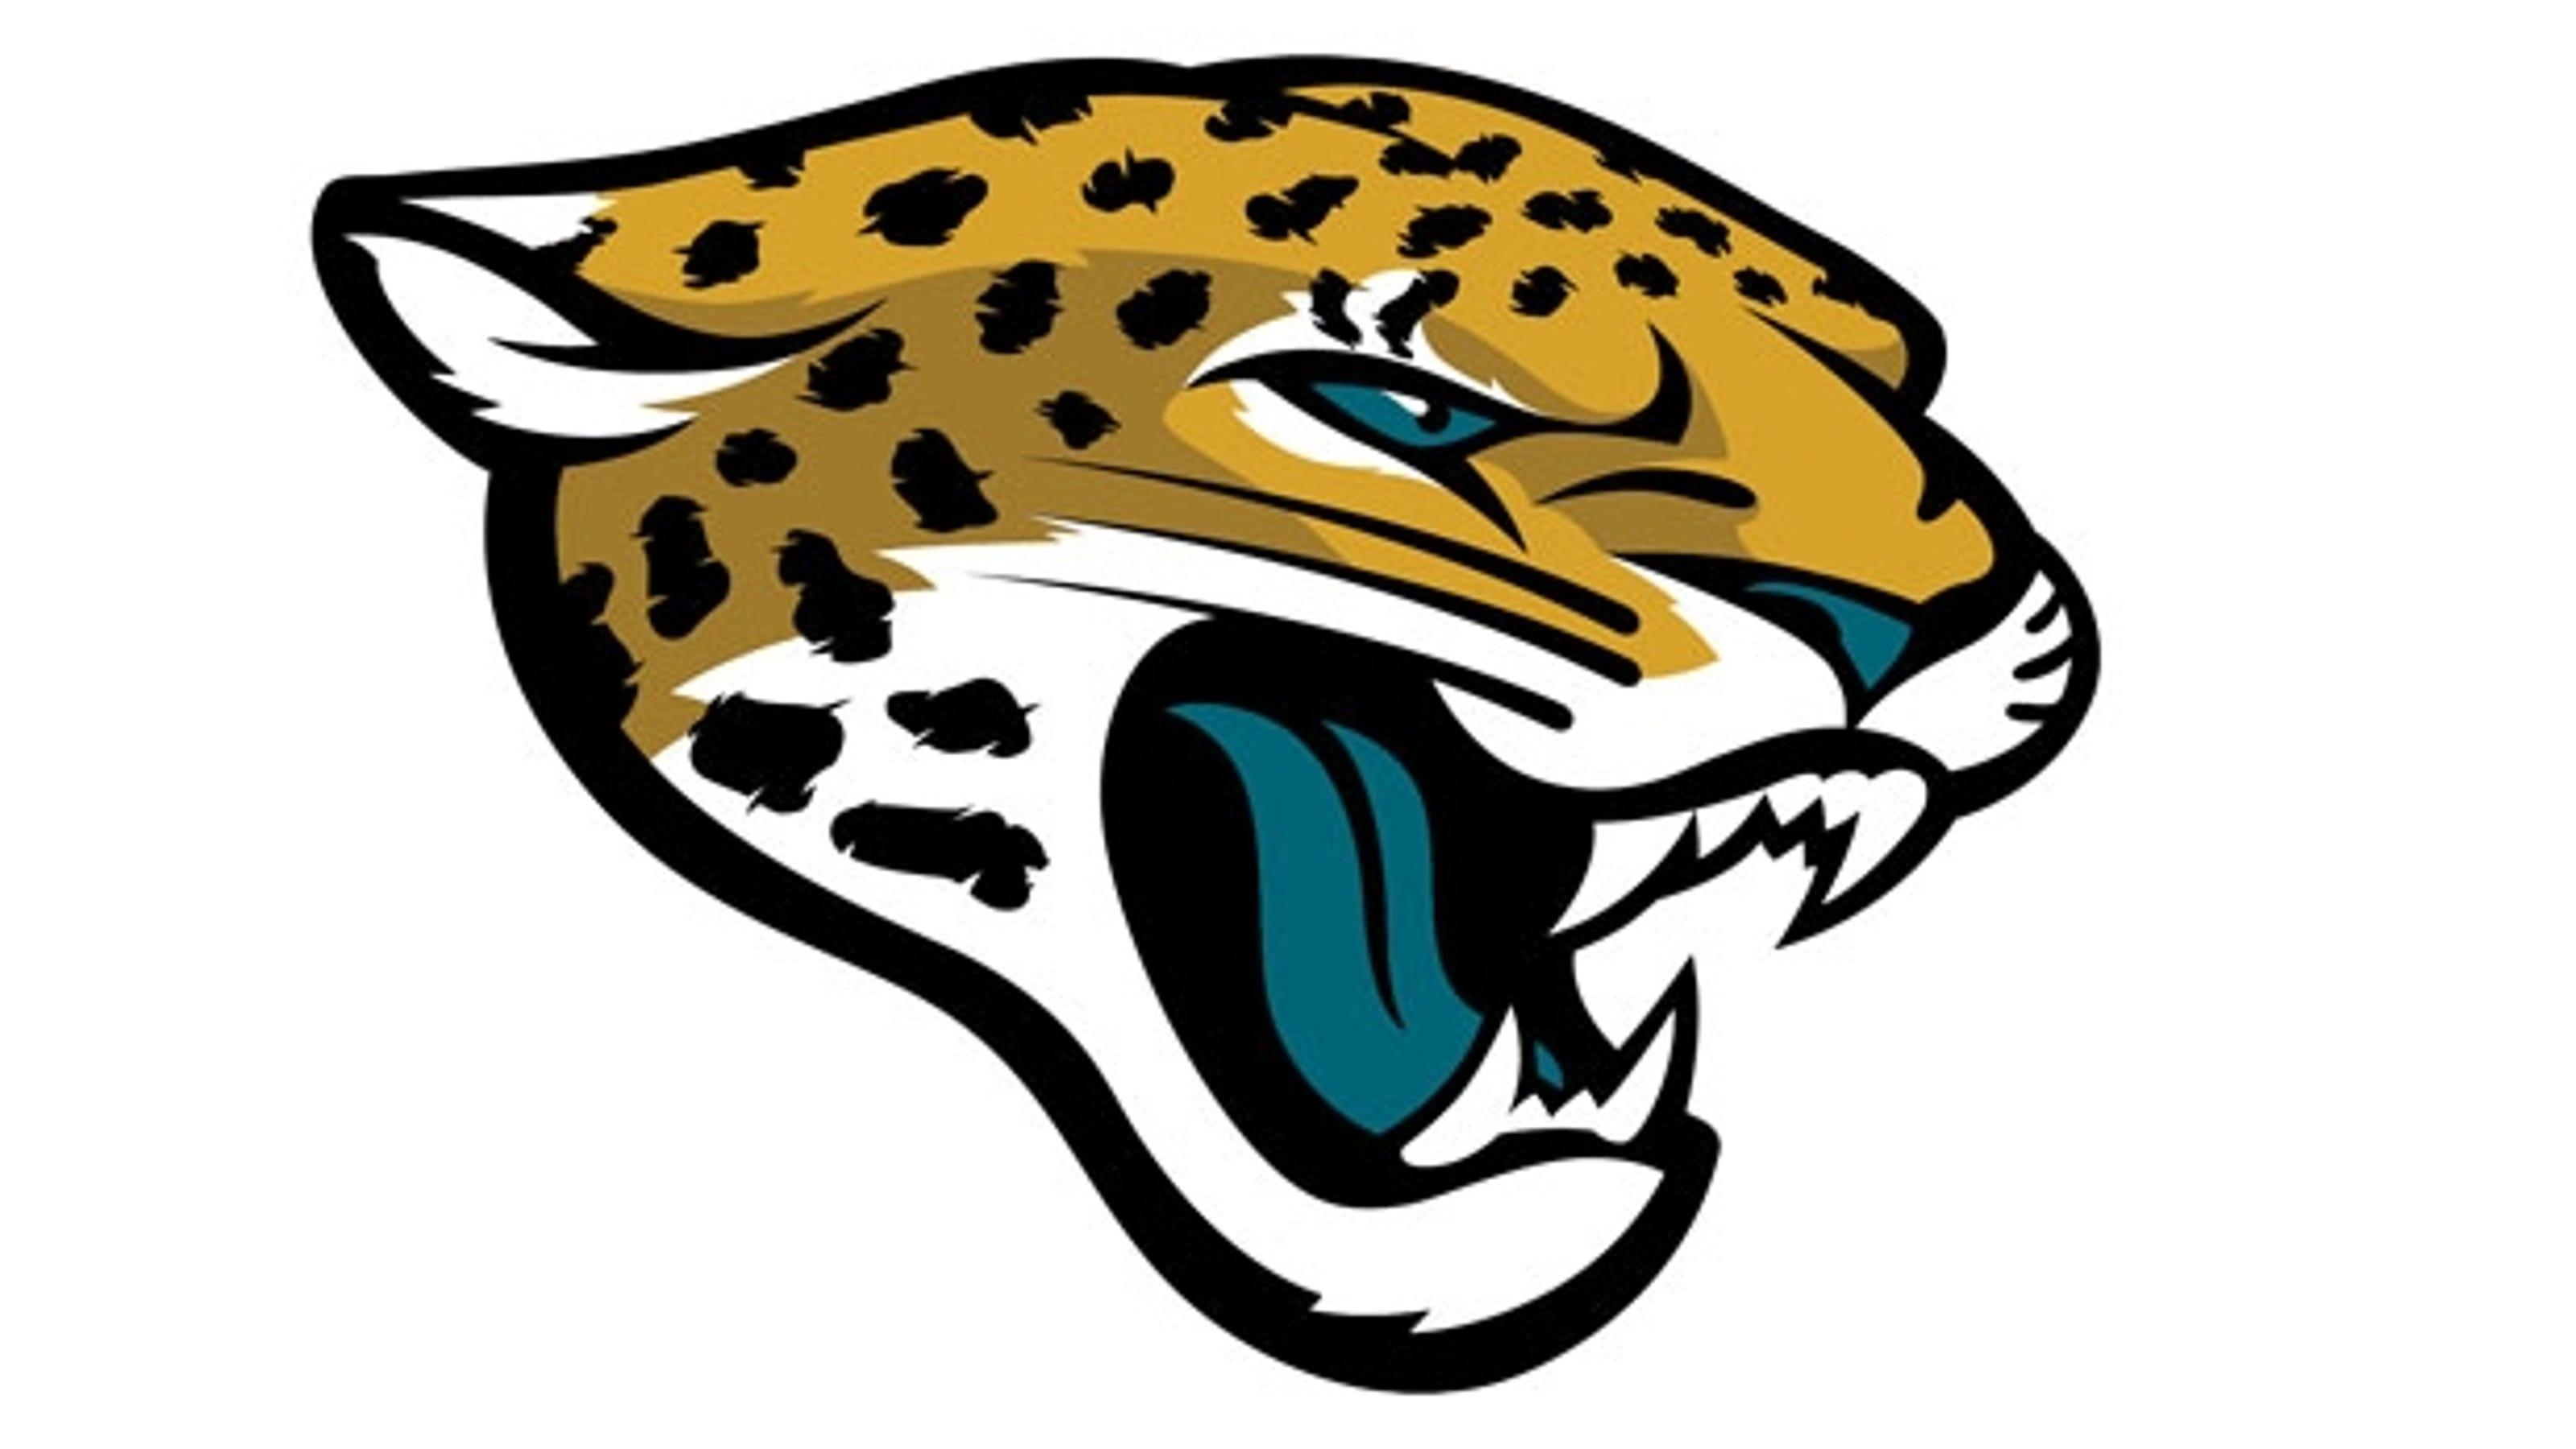 Jaguars New Helmet 2013 Jacksonville Jaguars d...